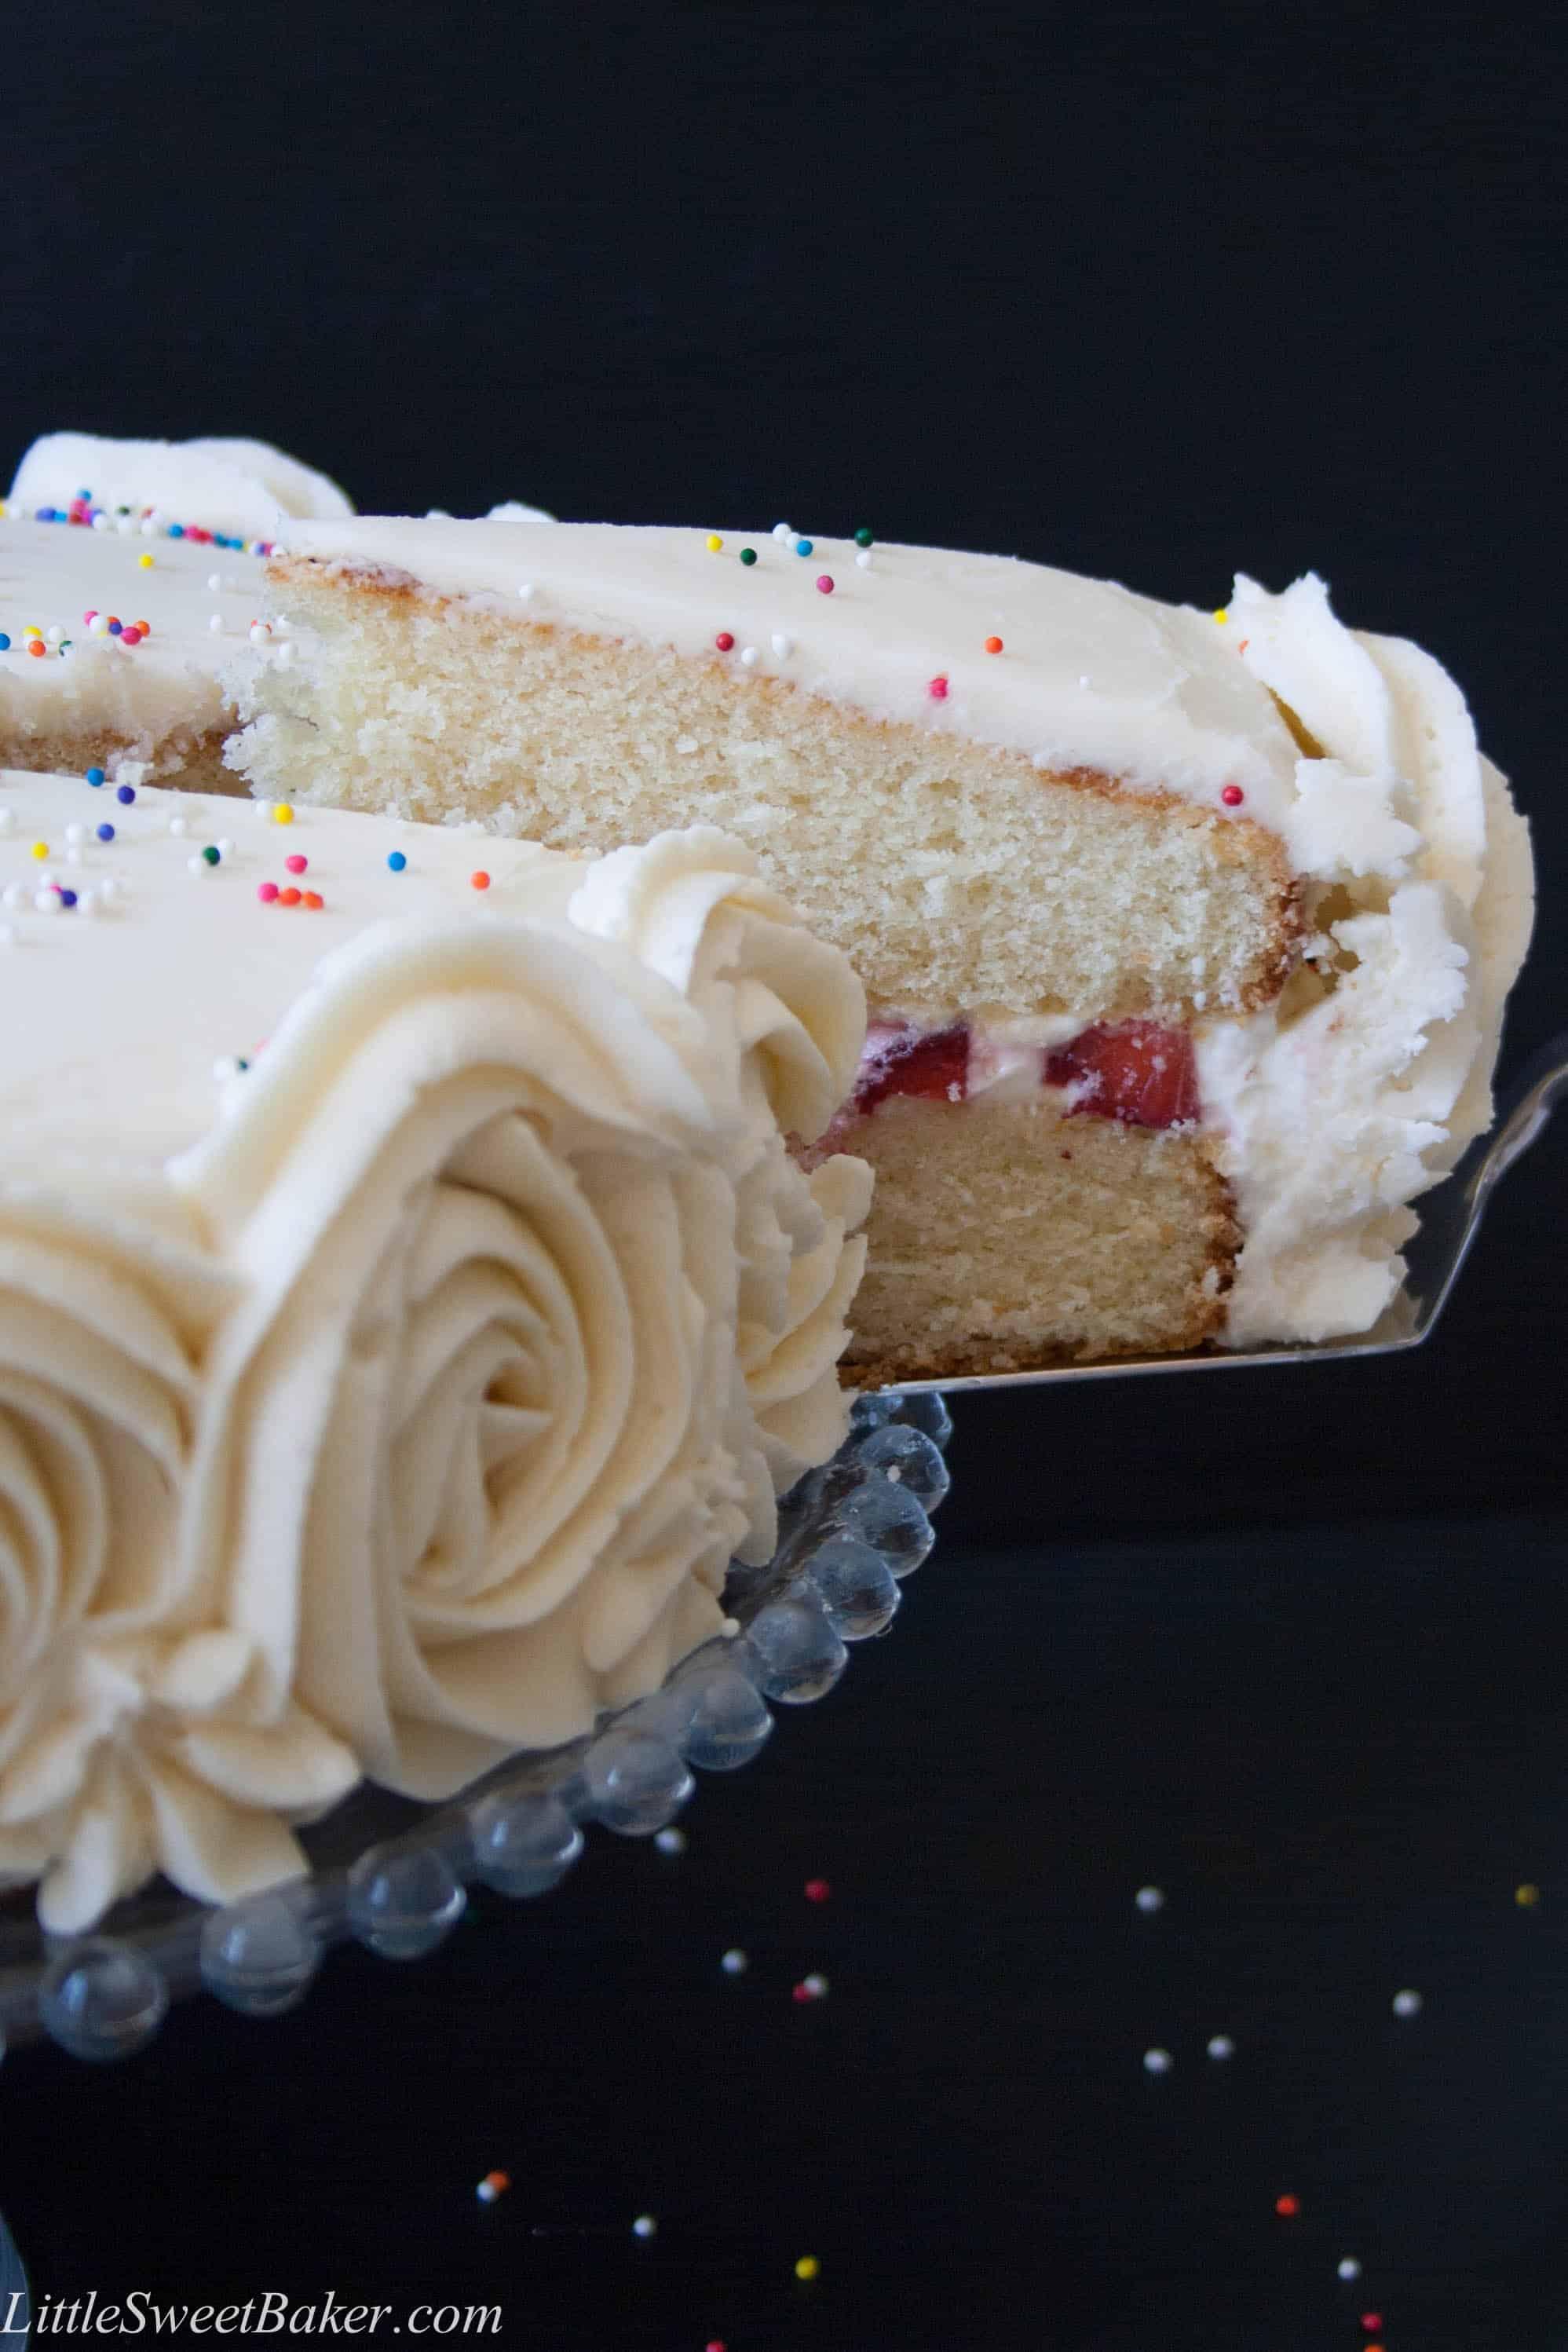 Vanilla Cake Recipe With Strawberries And Cream Filling